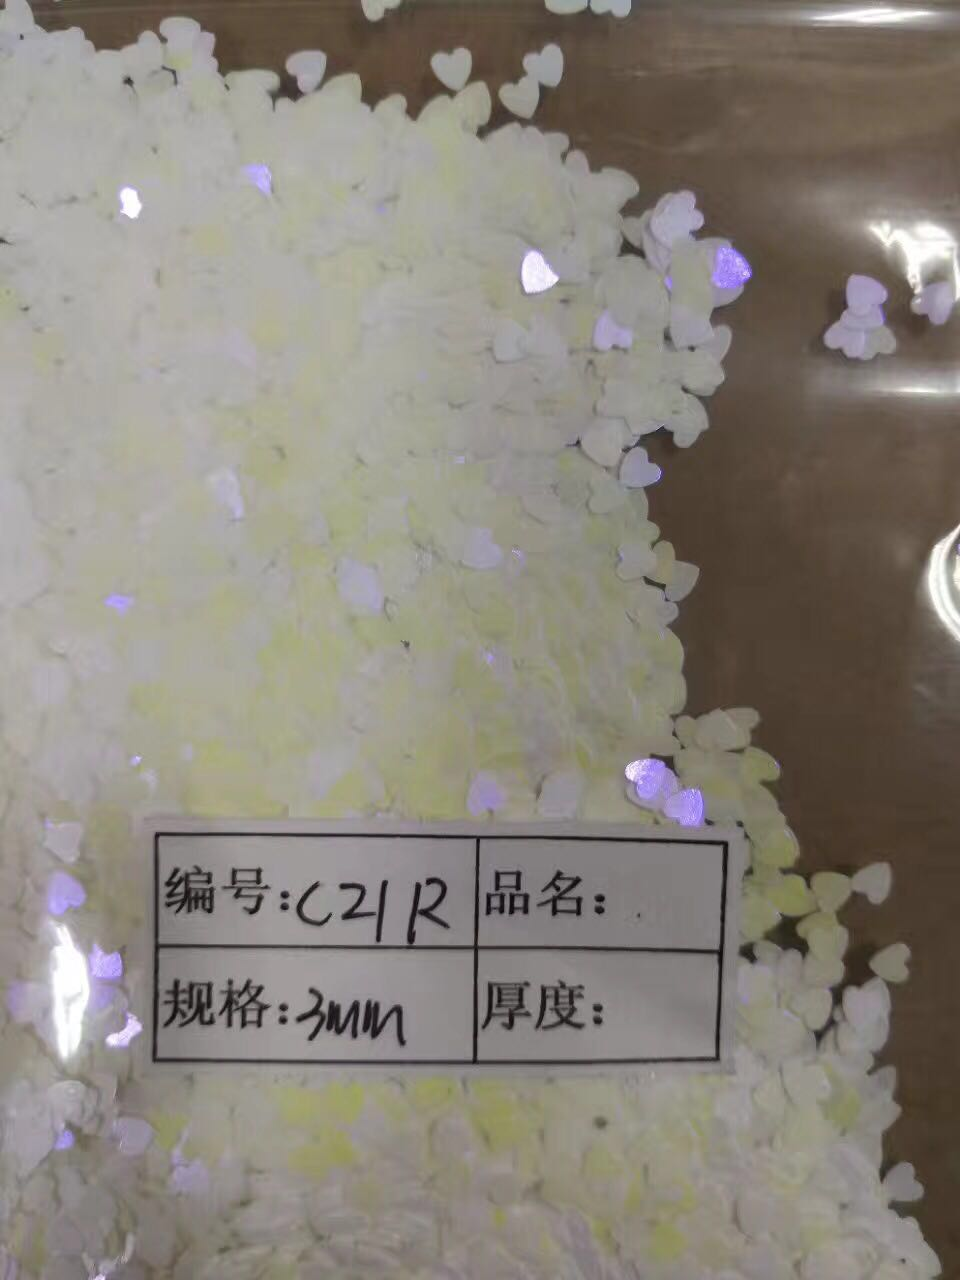 3mm Iridescent Purple Heart Loose glitter UV resin,nail gel, acrylic nail, nail polish glitter,nail stamping Opal Effect Glitter hisenlee 1728pc pack multi size ss3 ss10 blue green pink white opal nail rhinestone glitter flat back crystal gems 3d nail art